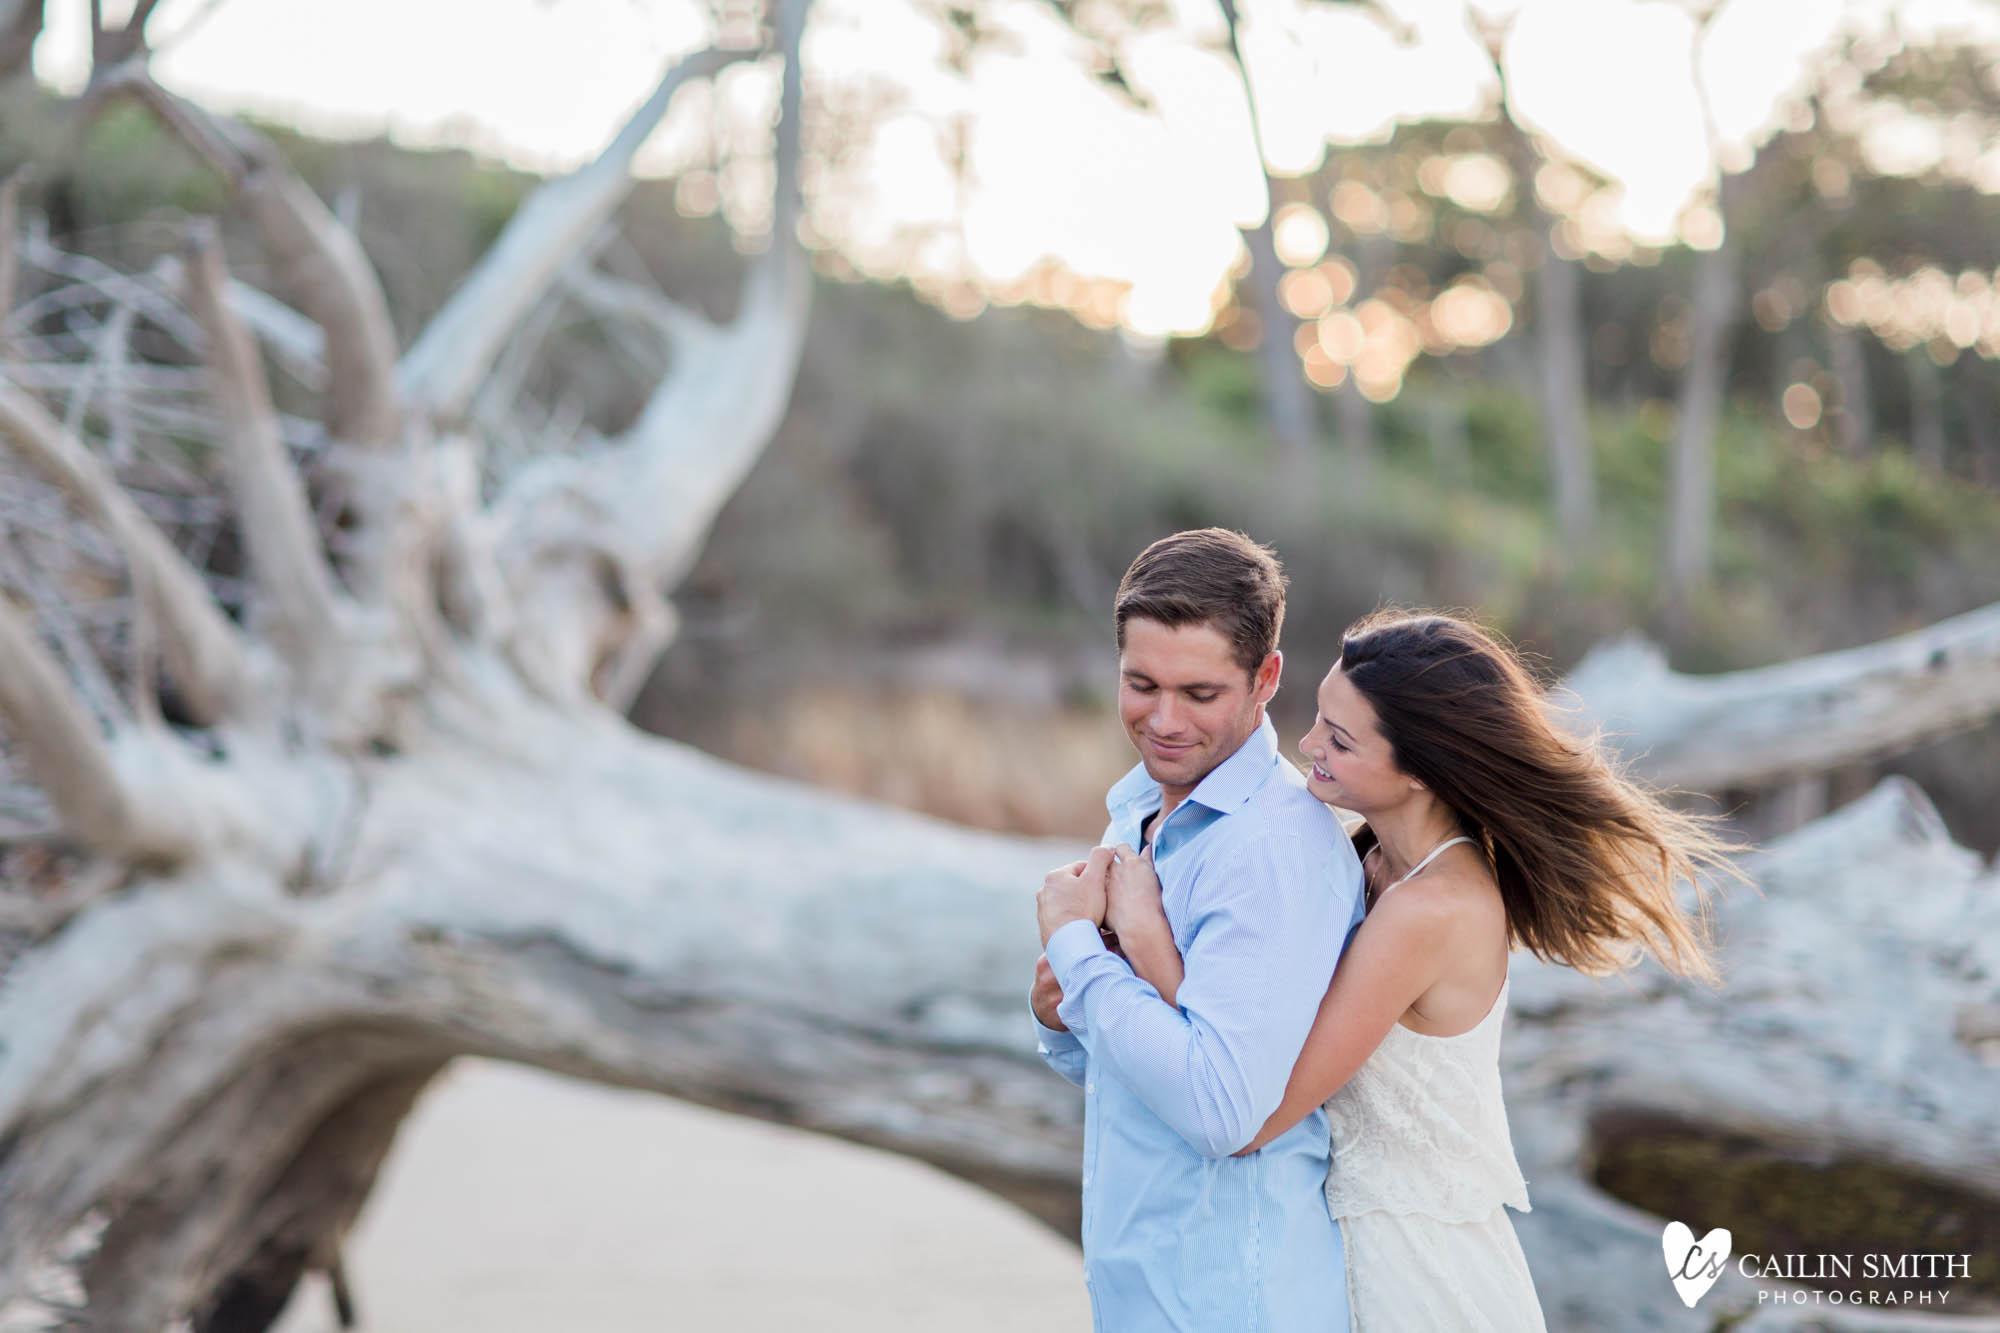 Megan_Tyson_Little_Talbot_Engagement_008.jpg